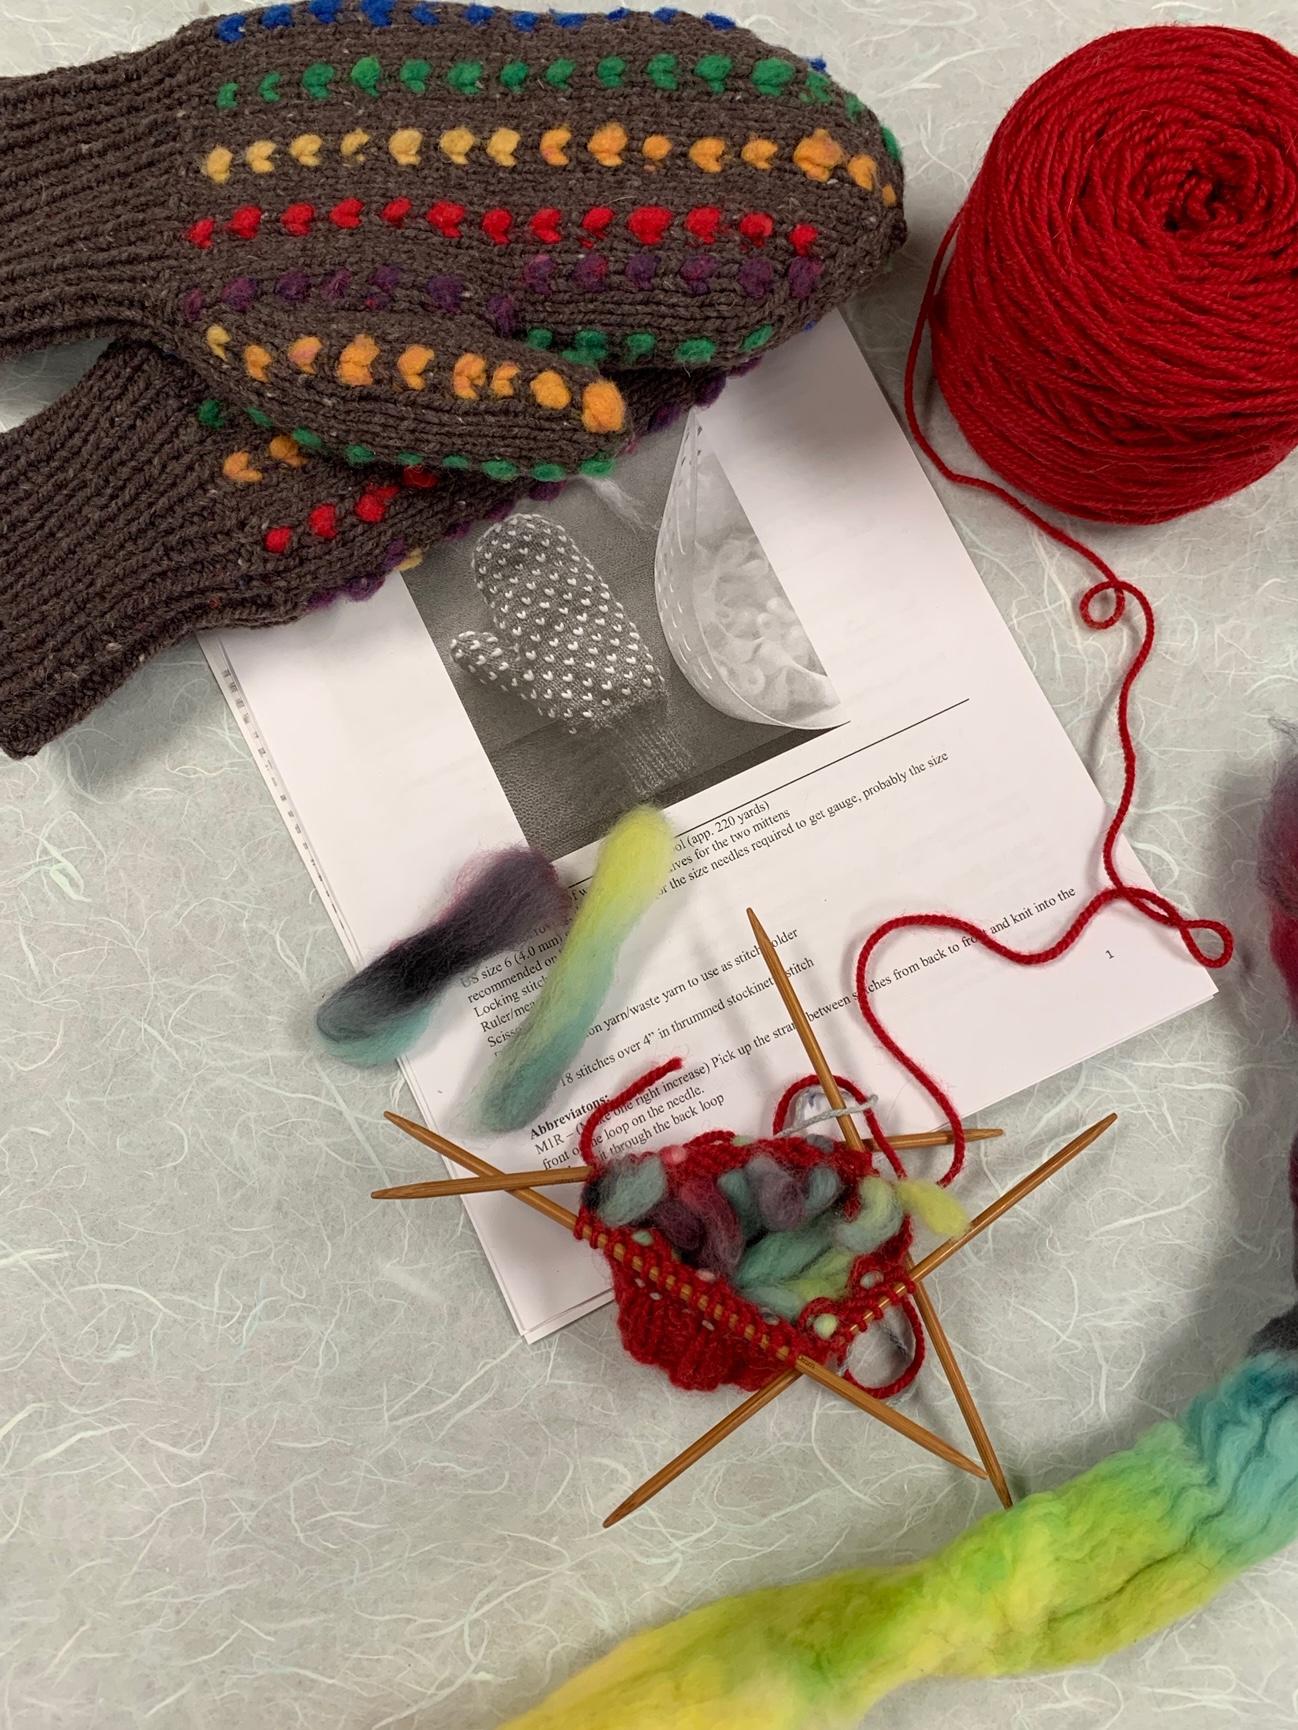 Thrummed Mittens knitting class ImagiKnit Yarn Shop Omaha